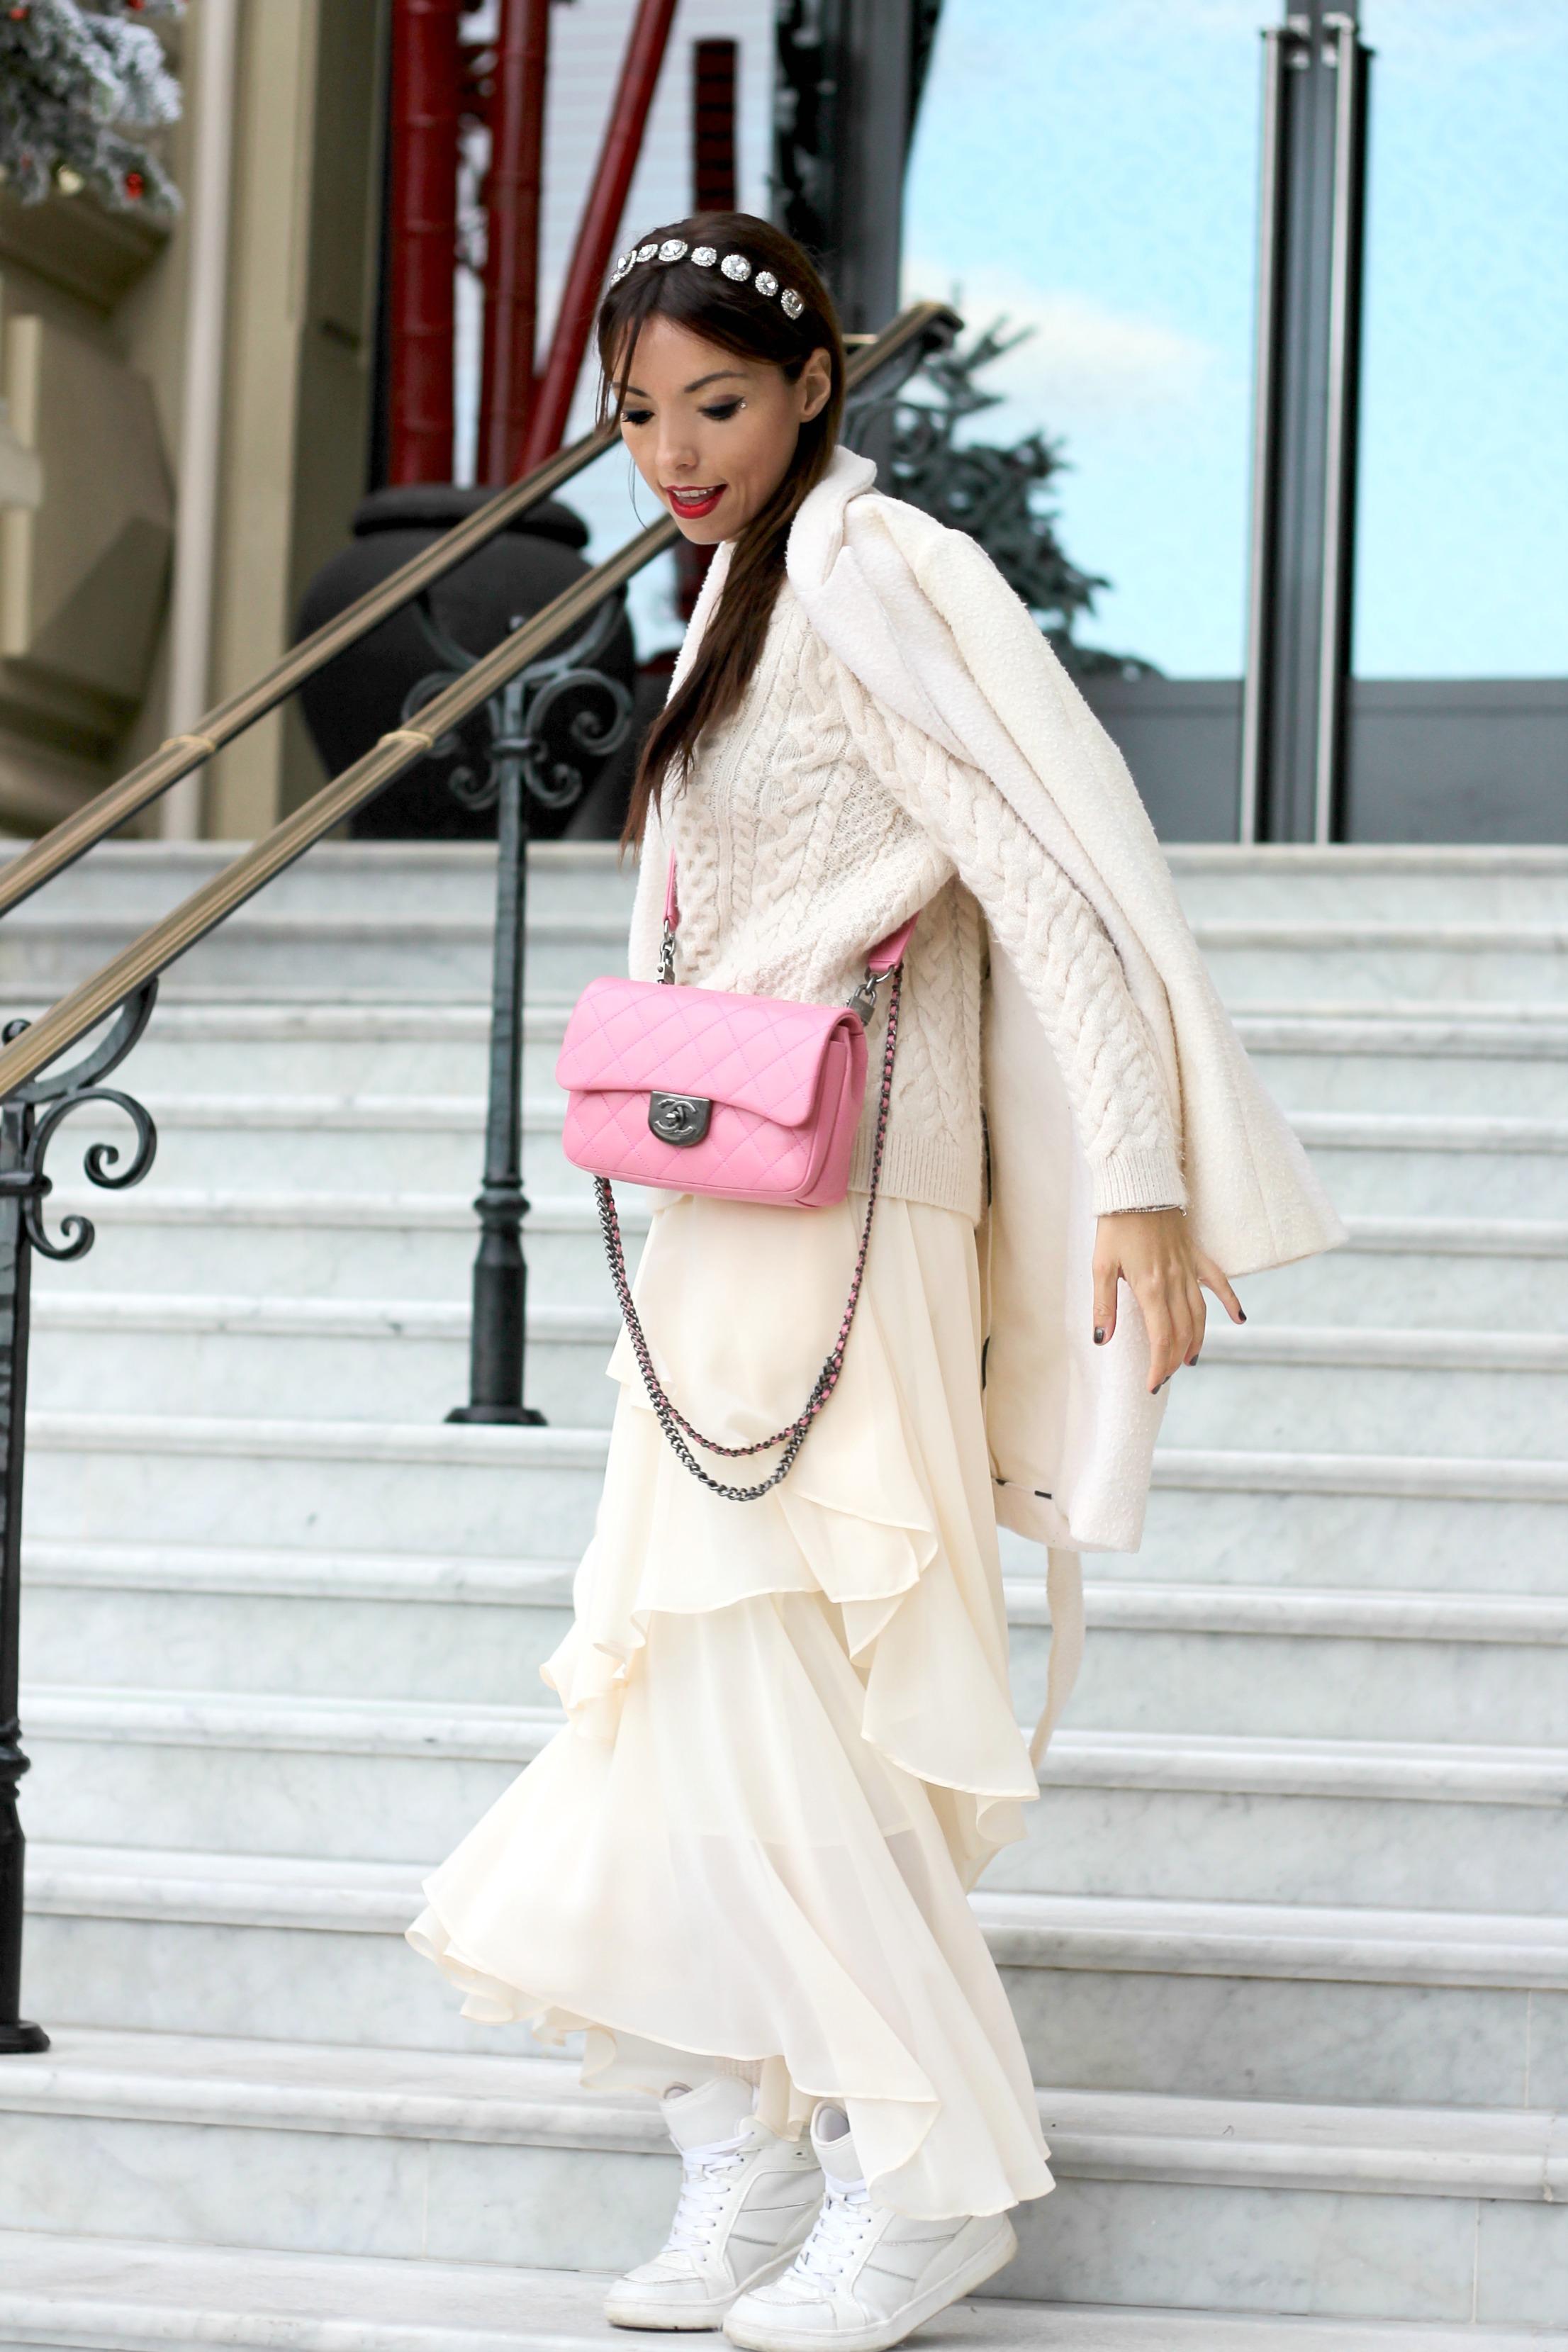 elisa bellino, chanel bag pink, theladycracy.it, fashion blogger italiane famose, fashion blog italia, tall white outfit,prospettive lavoro futuro, total white look, zarina outfit, chanel rosa borsa,